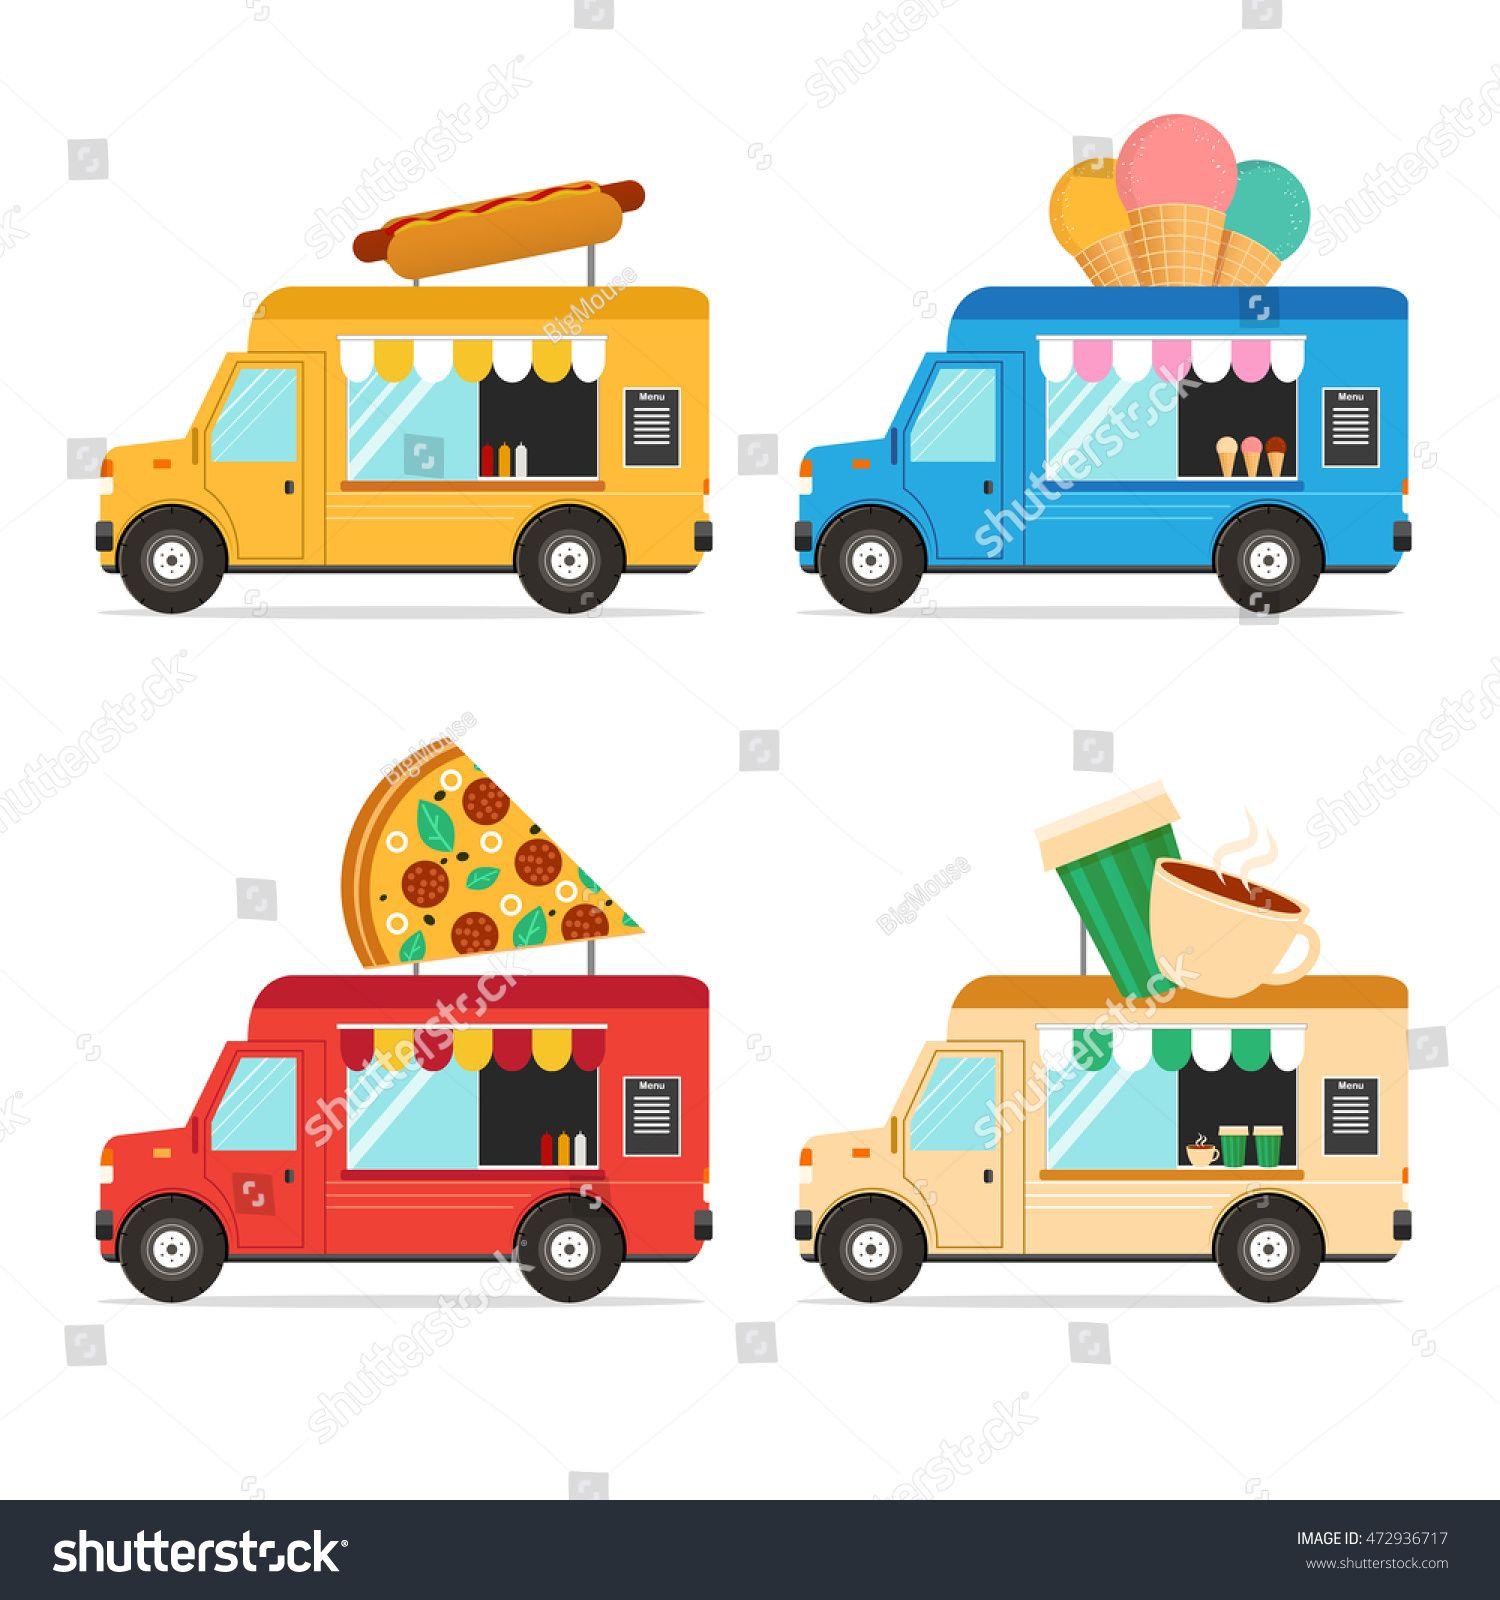 Street Fast Food Truck Set Flat Cartoon Design Vector